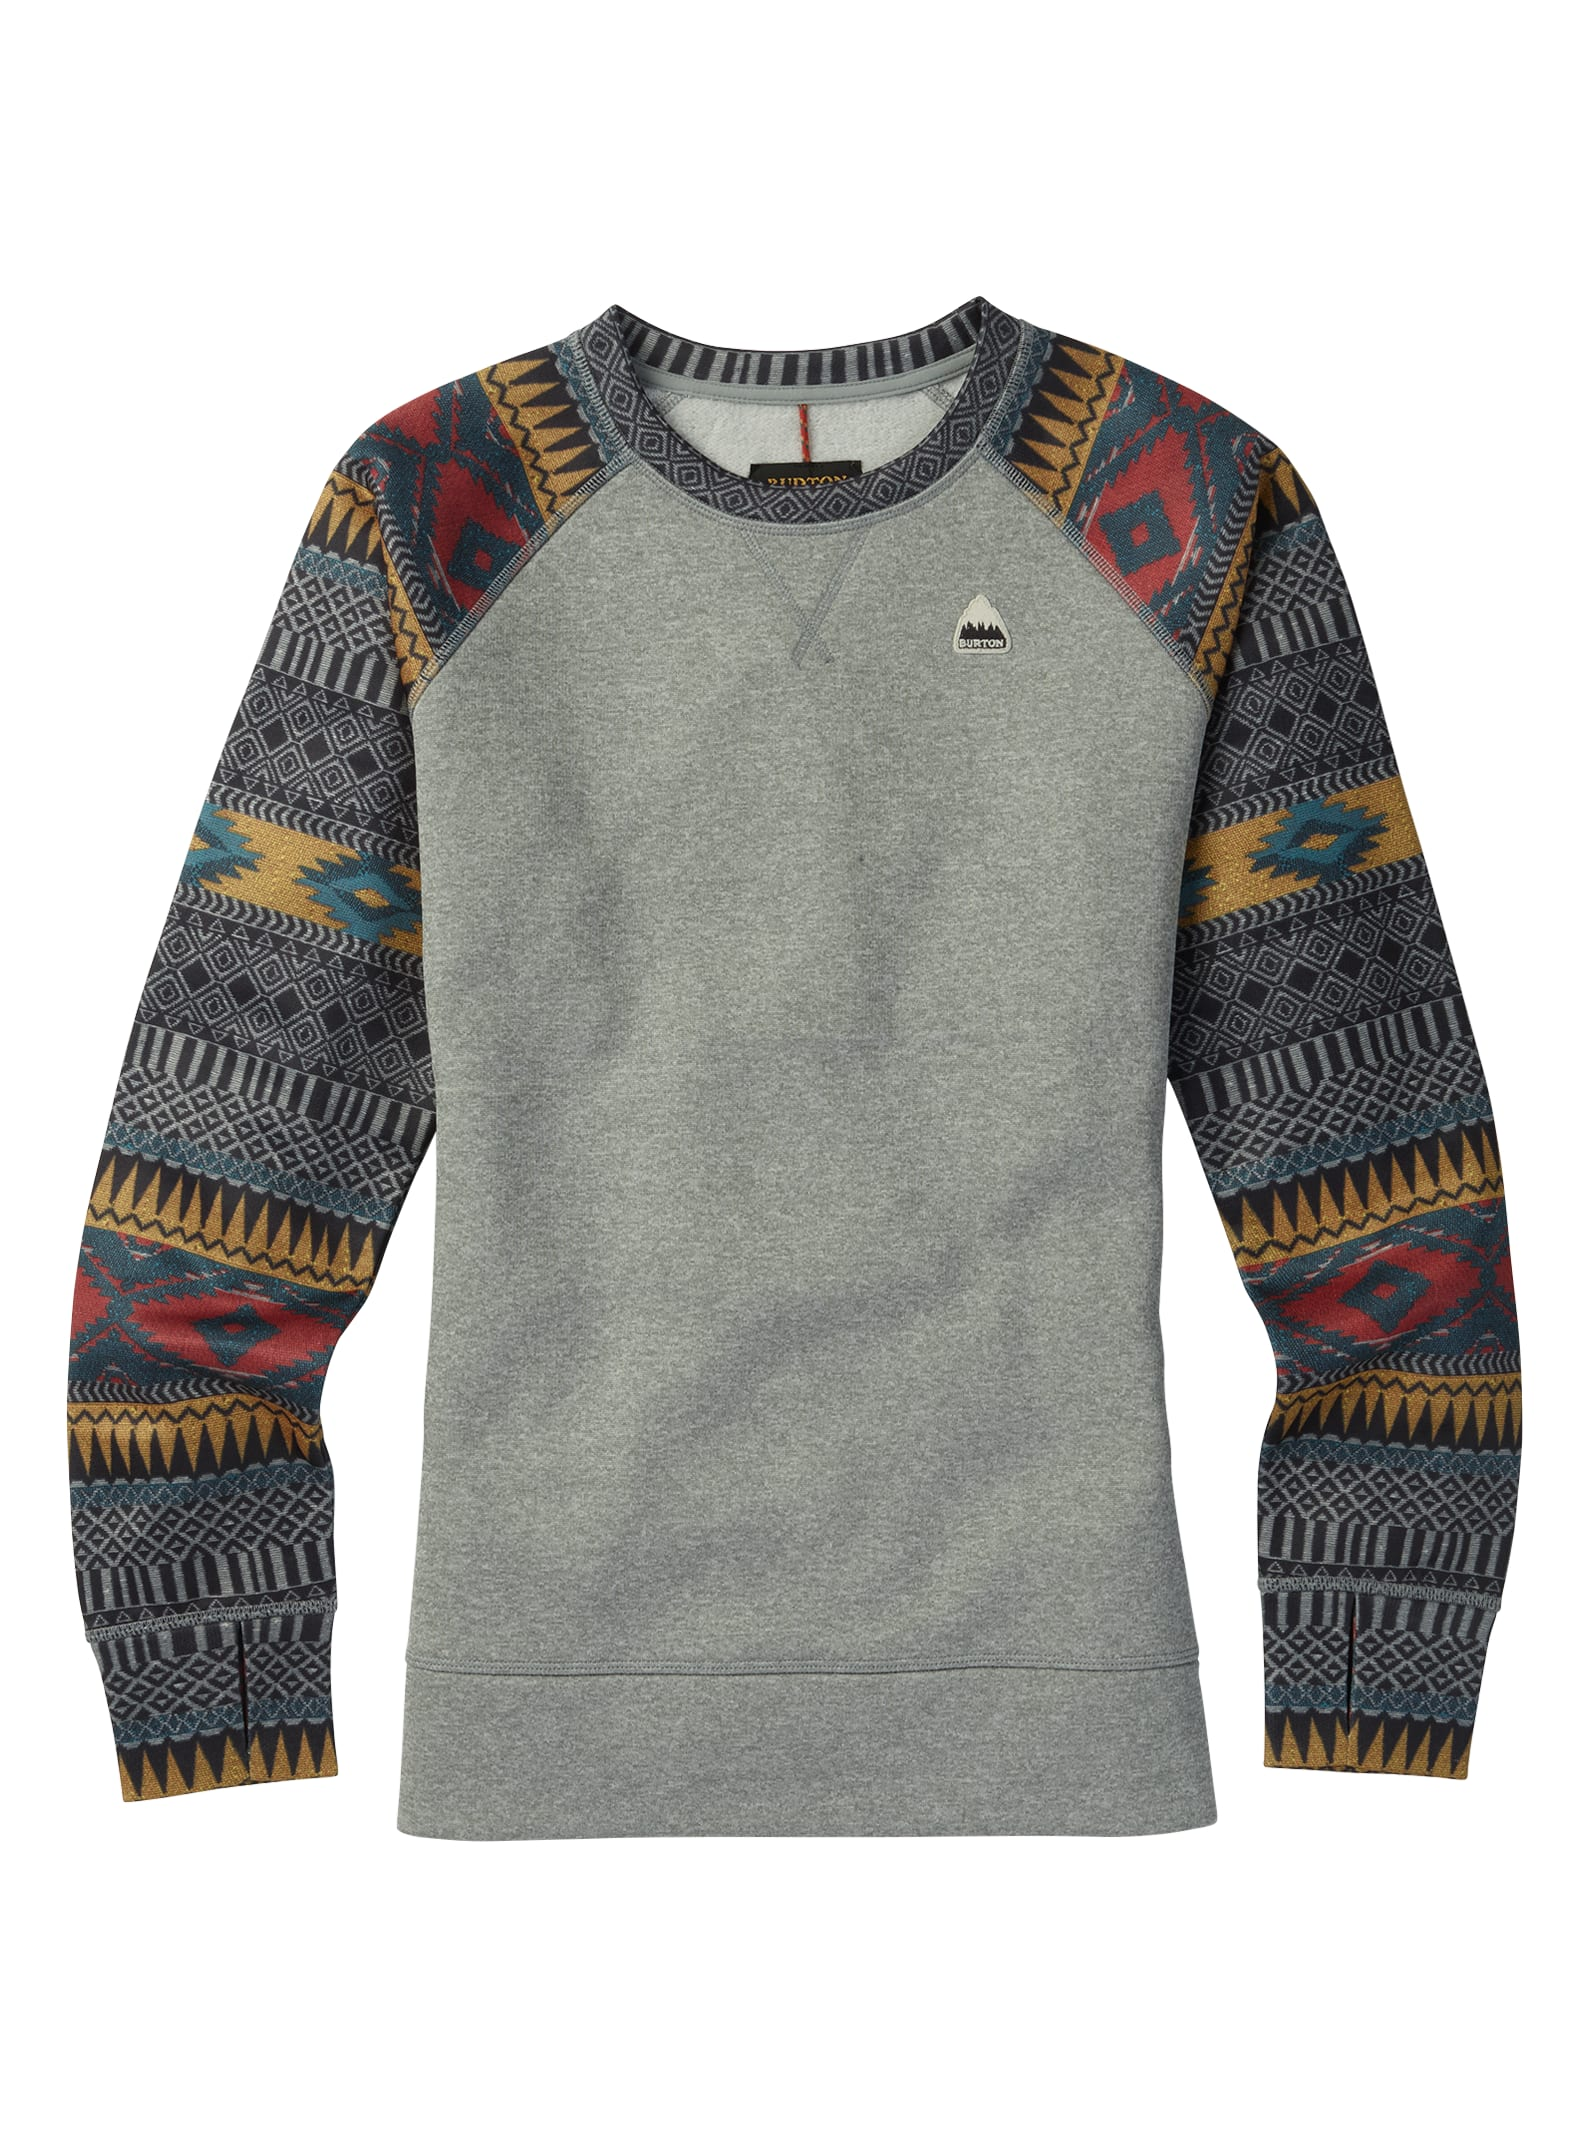 Practical Pullover Damen Damenmode Kleidung & Accessoires